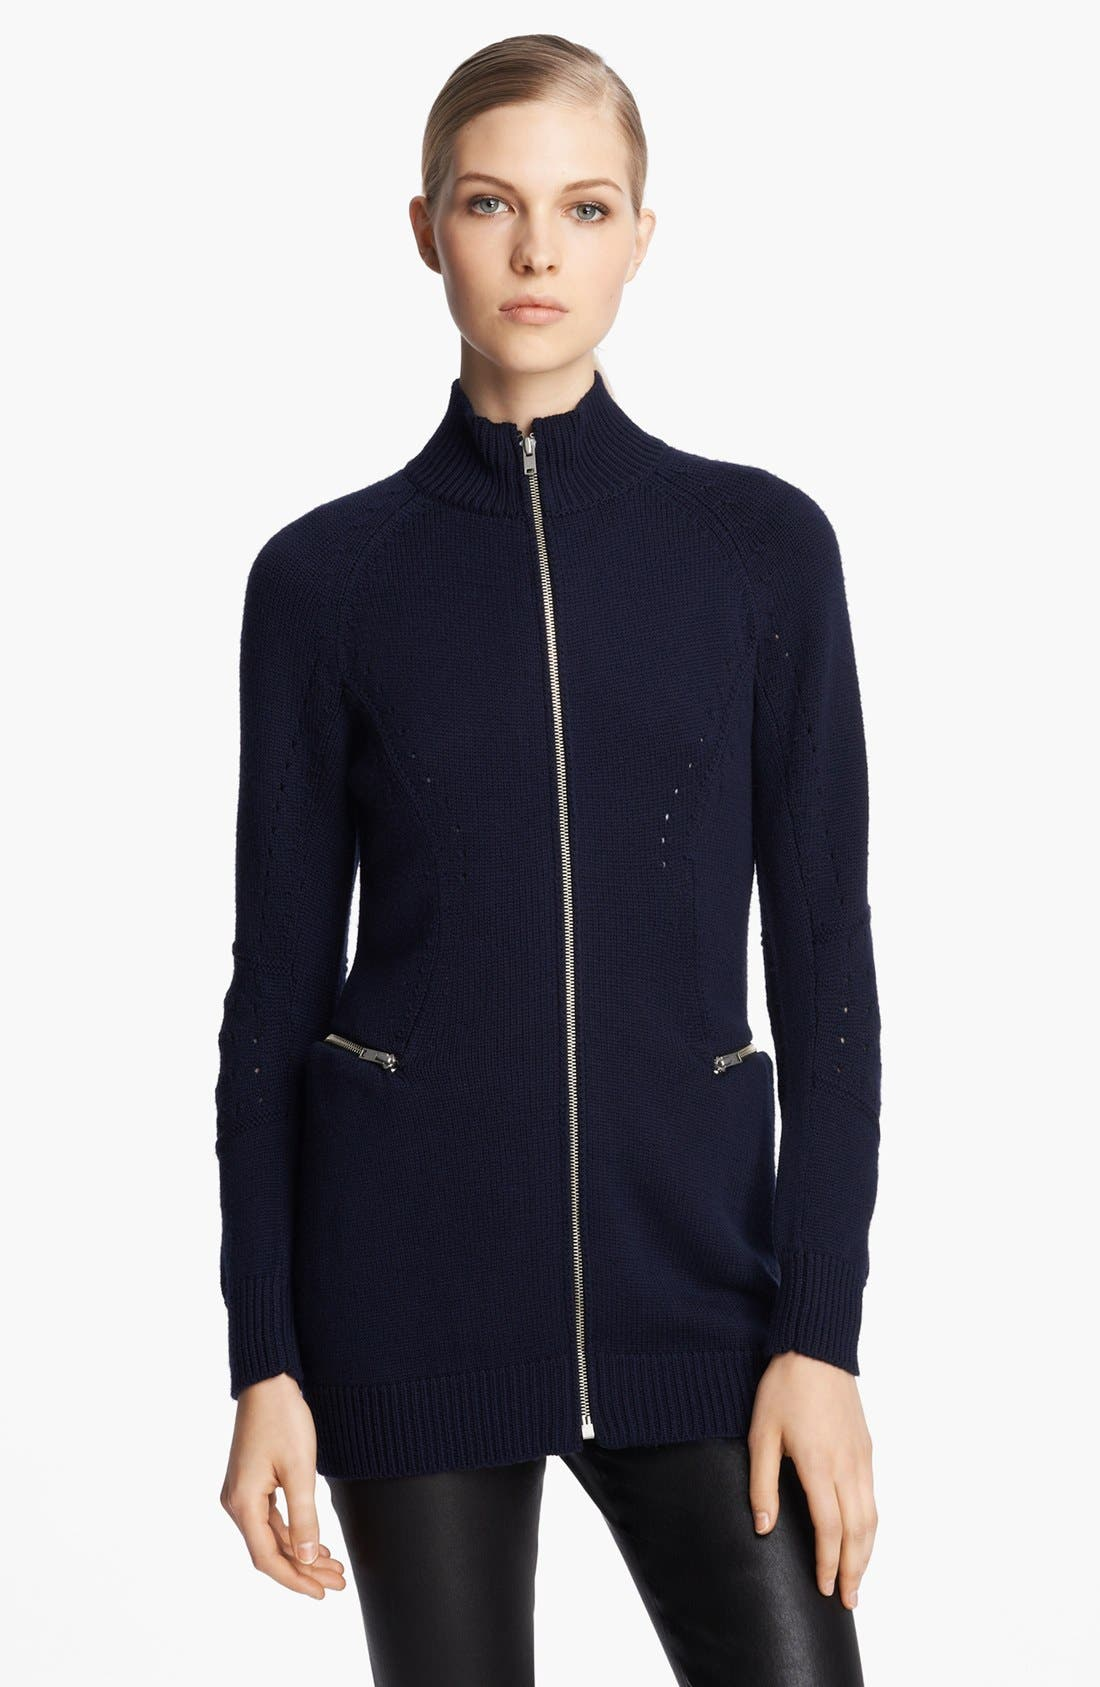 Alternate Image 1 Selected - Junya Watanabe Mock Neck Wool Jersey Sweater